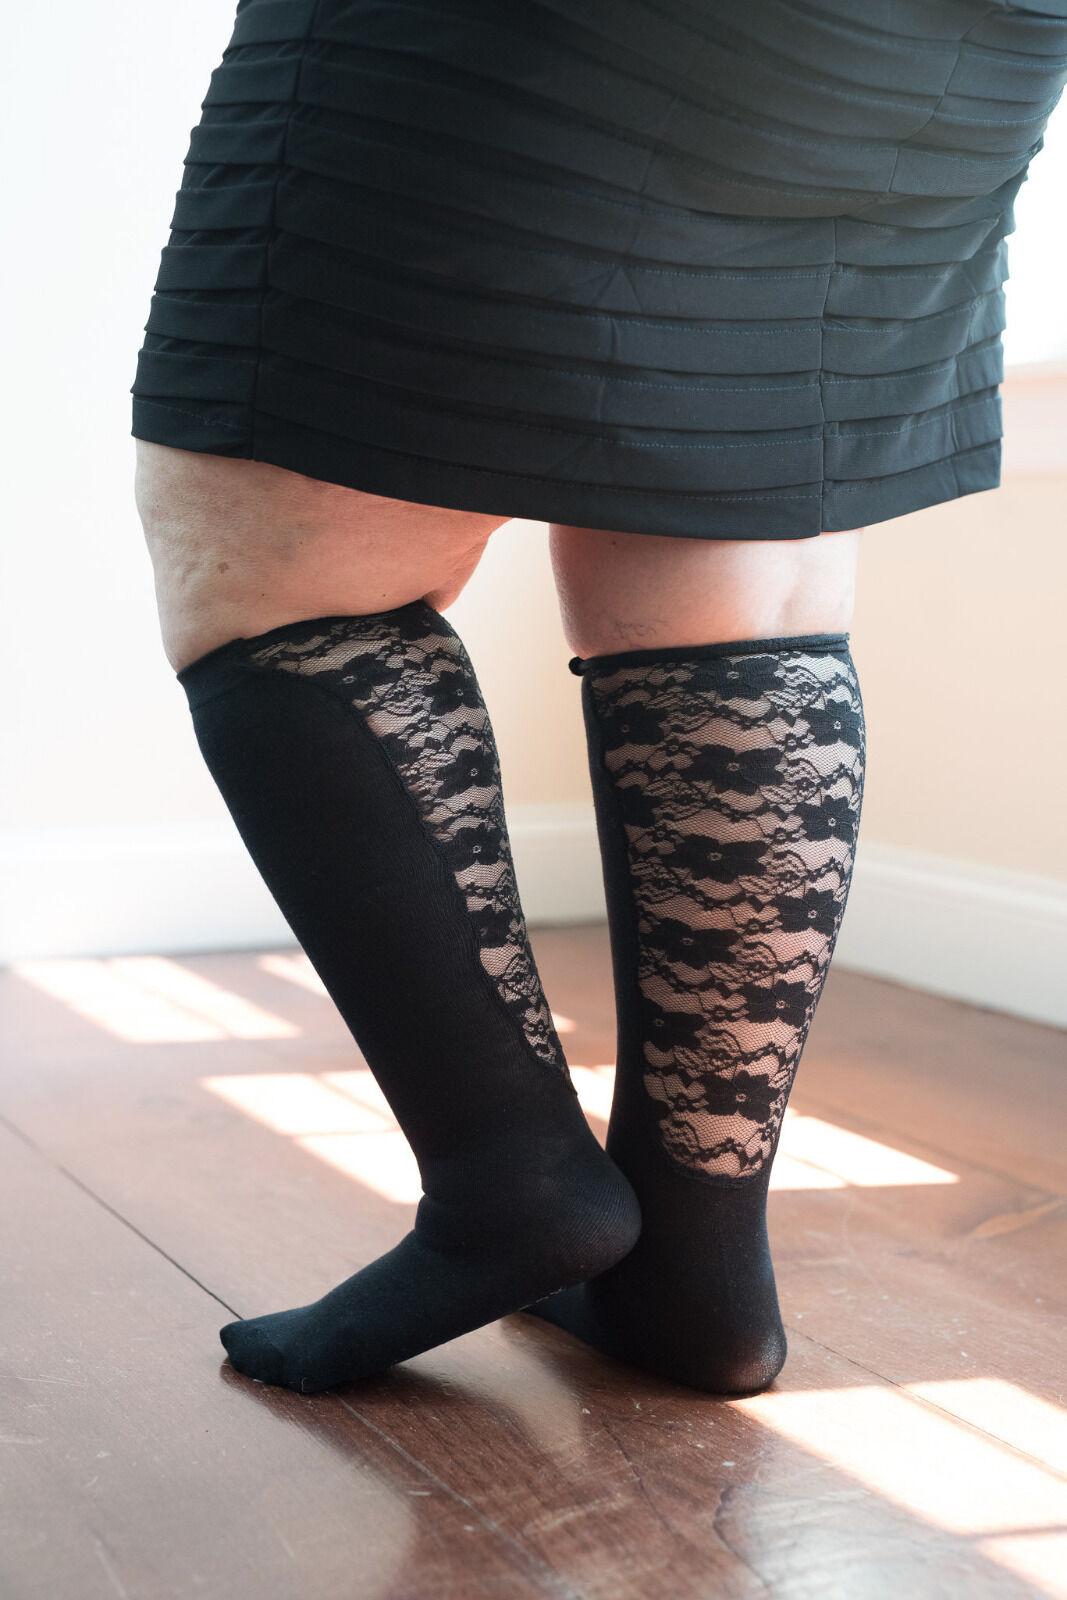 305803d13d Xpandasox Plus Size/lymphedema Socks 24 Inches at Calf Black Lace ...